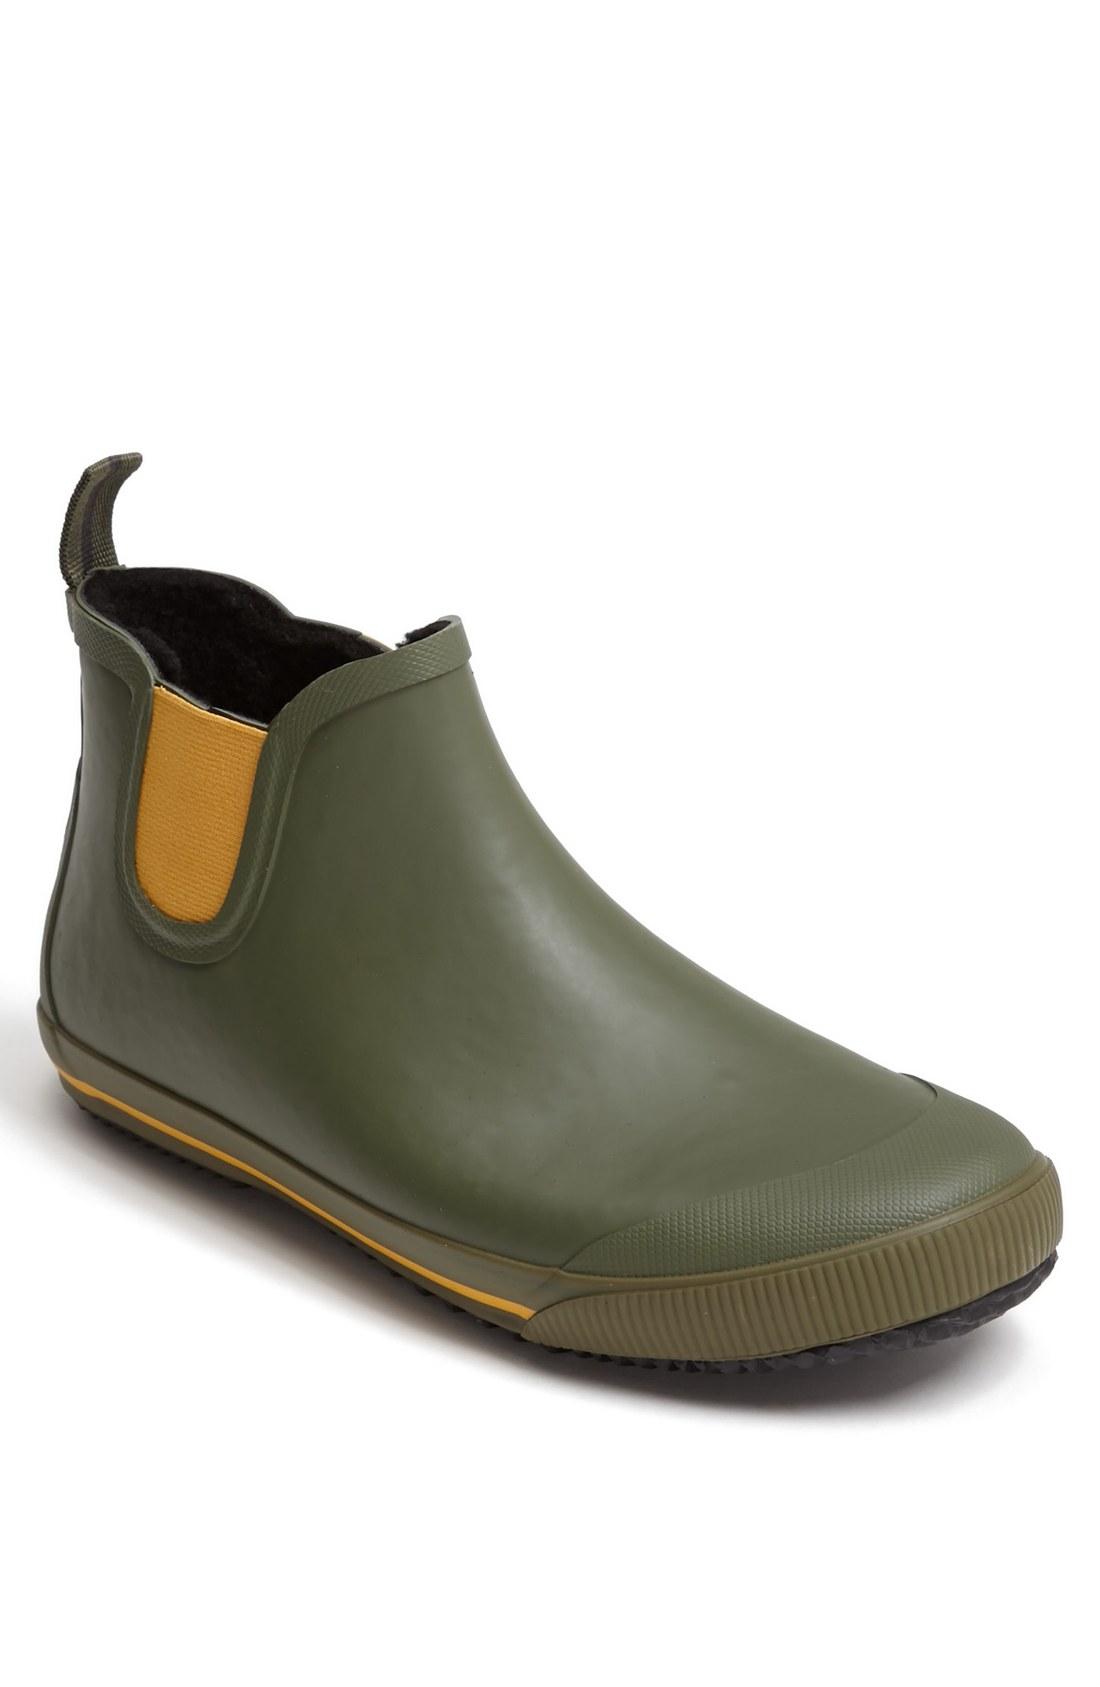 Tretorn Str 229 La Vinter Rain Boot In Green For Men